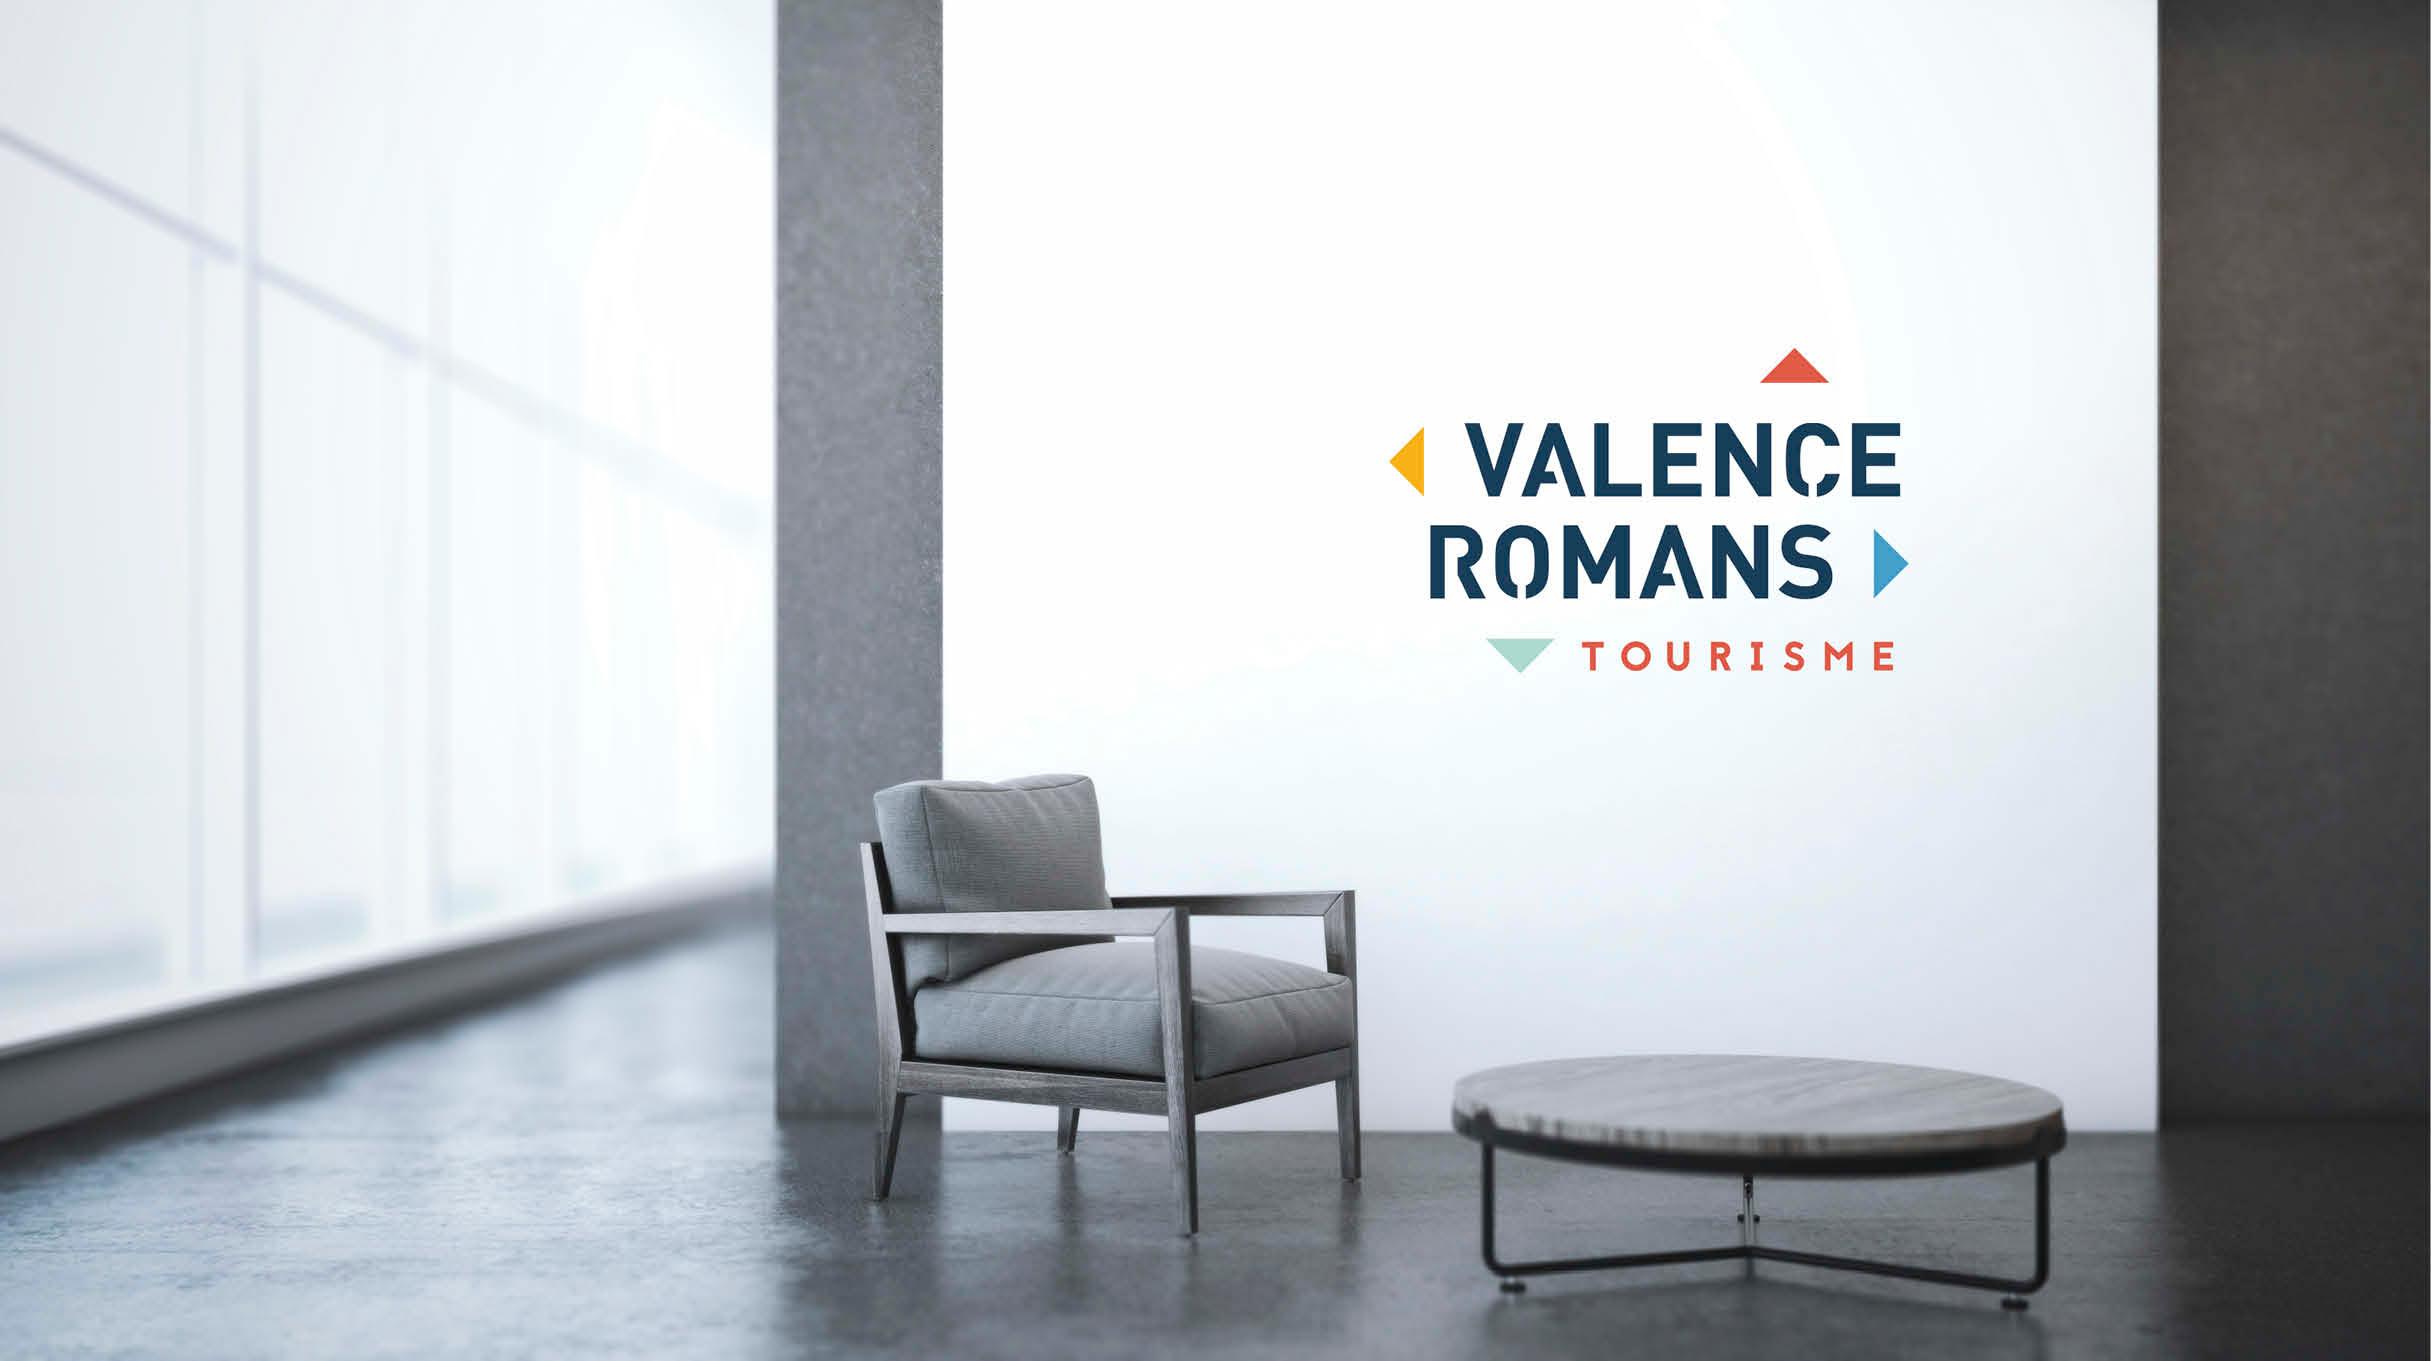 reference-valence-romans-tourisme-4